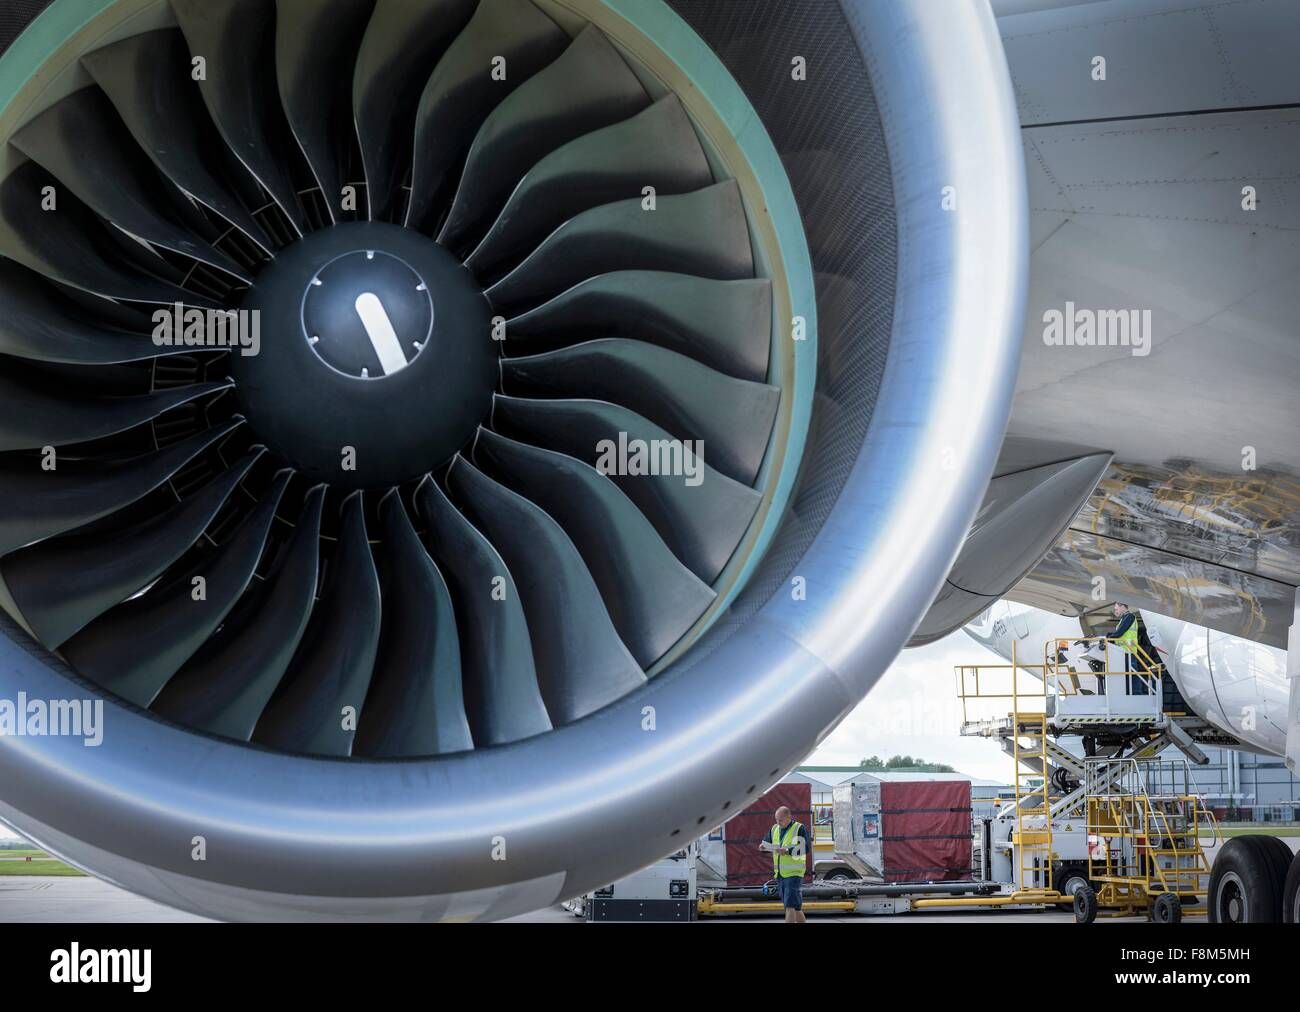 Nahaufnahme von Jet Turbine auf A380-Flugzeuge Stockbild